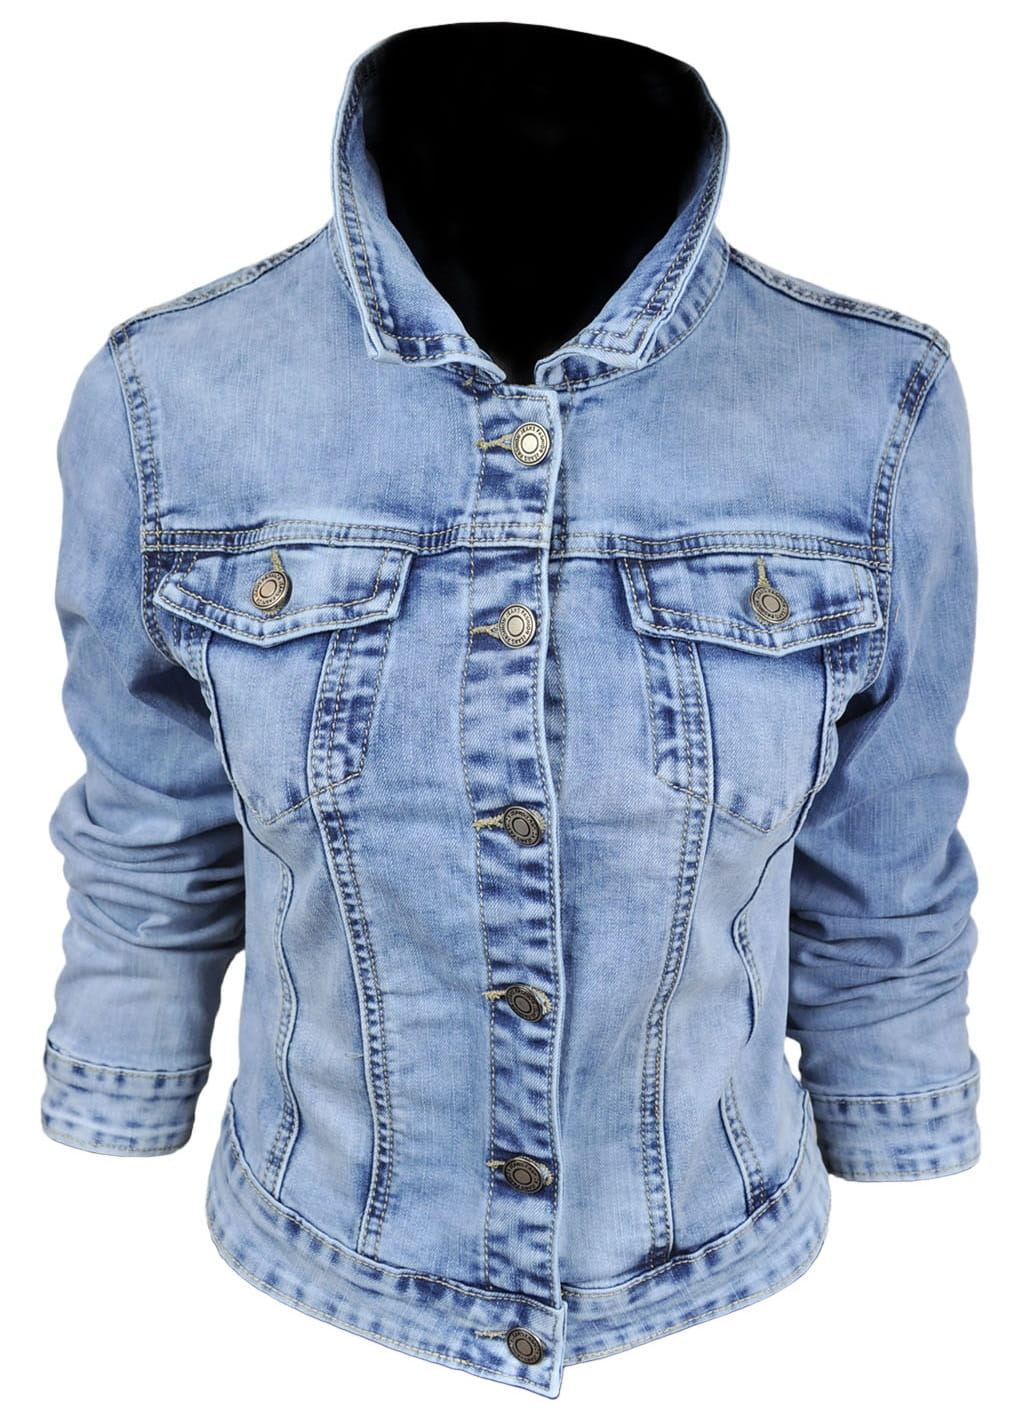 Wiosenna jeansowa damska kurtka jeans katana BASIC - 122